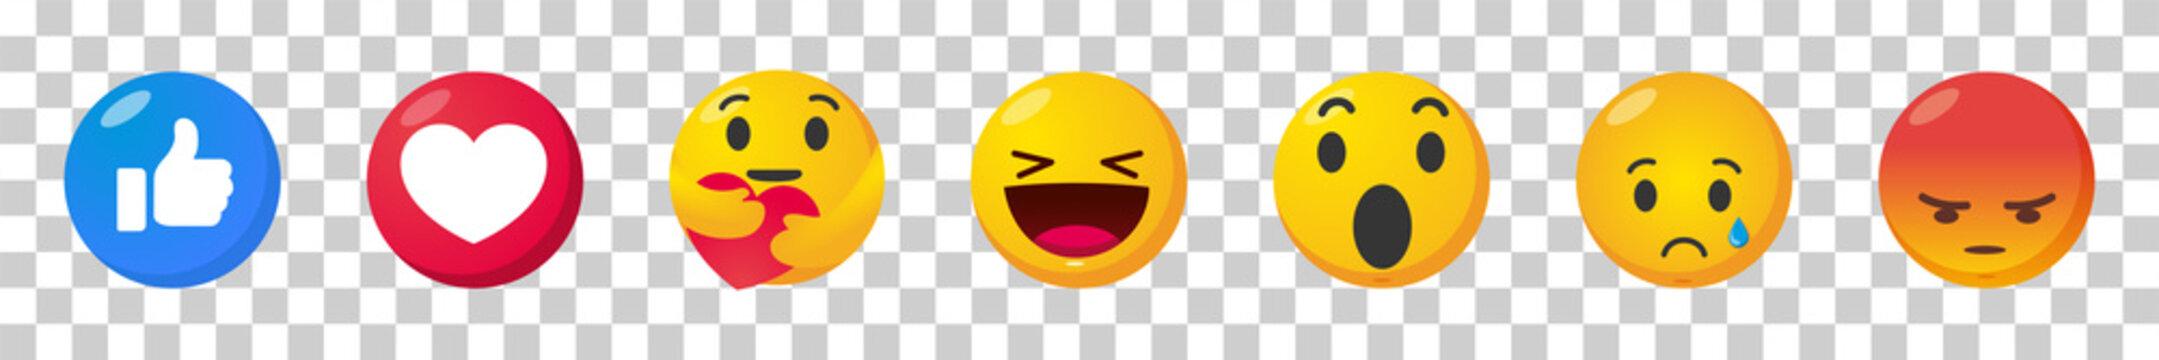 Facebook emoticon buttons. Collection of Emoji Reactions for Social Network. Vector illustration. EPS 10. Vinnitsa, Ukraine - July 2, 2020